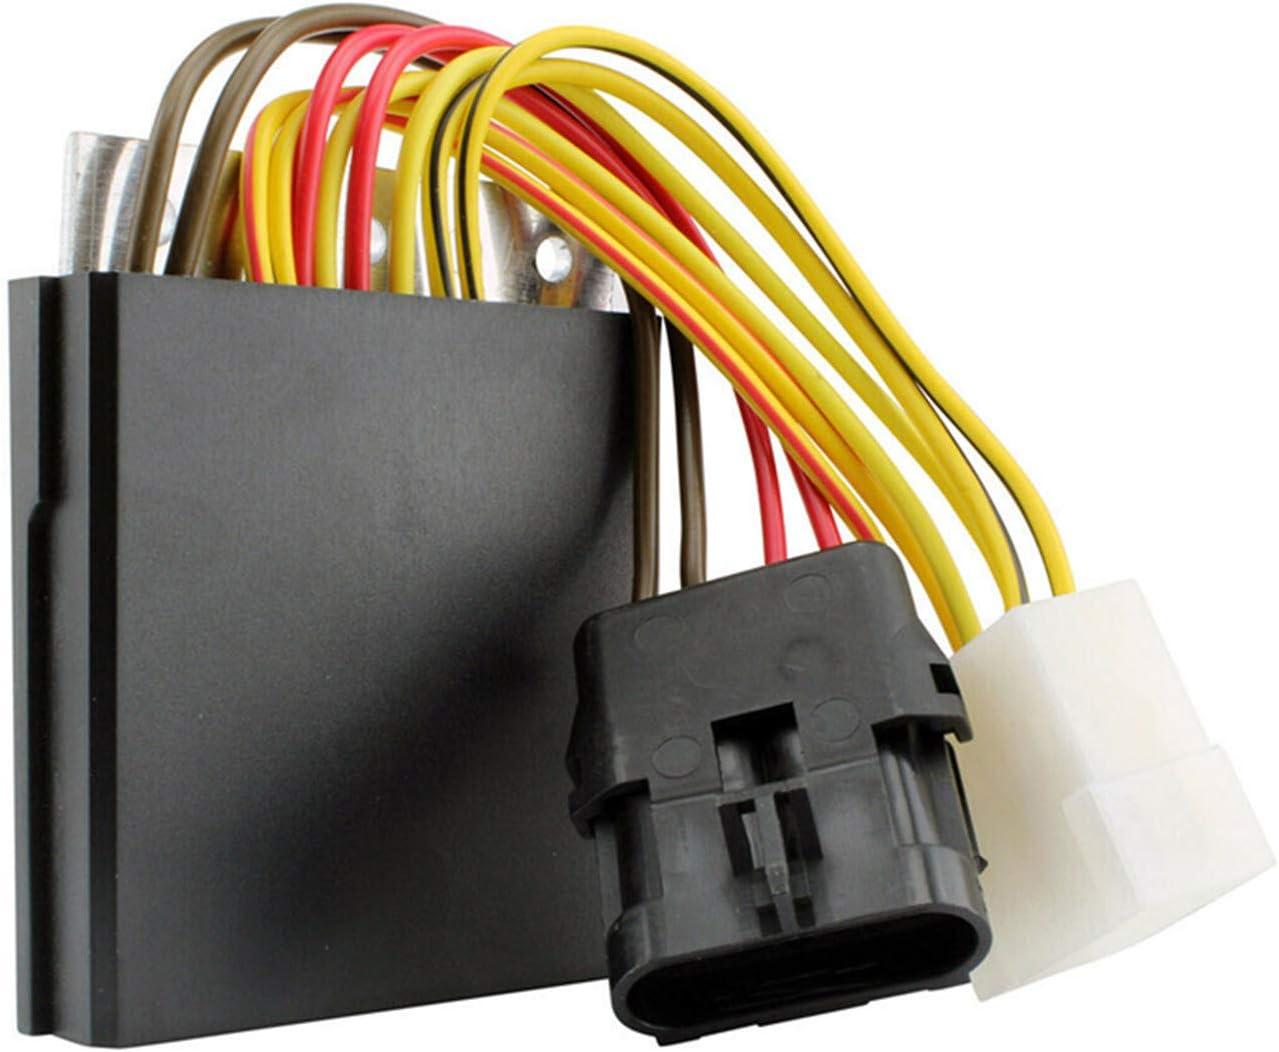 4011024//2205239 Voltage Regulator Rectifier for Polaris Sportsman 700 EFI 2004 ATV LR302-1 KIT-RECT REG 3 PHASE 2205239